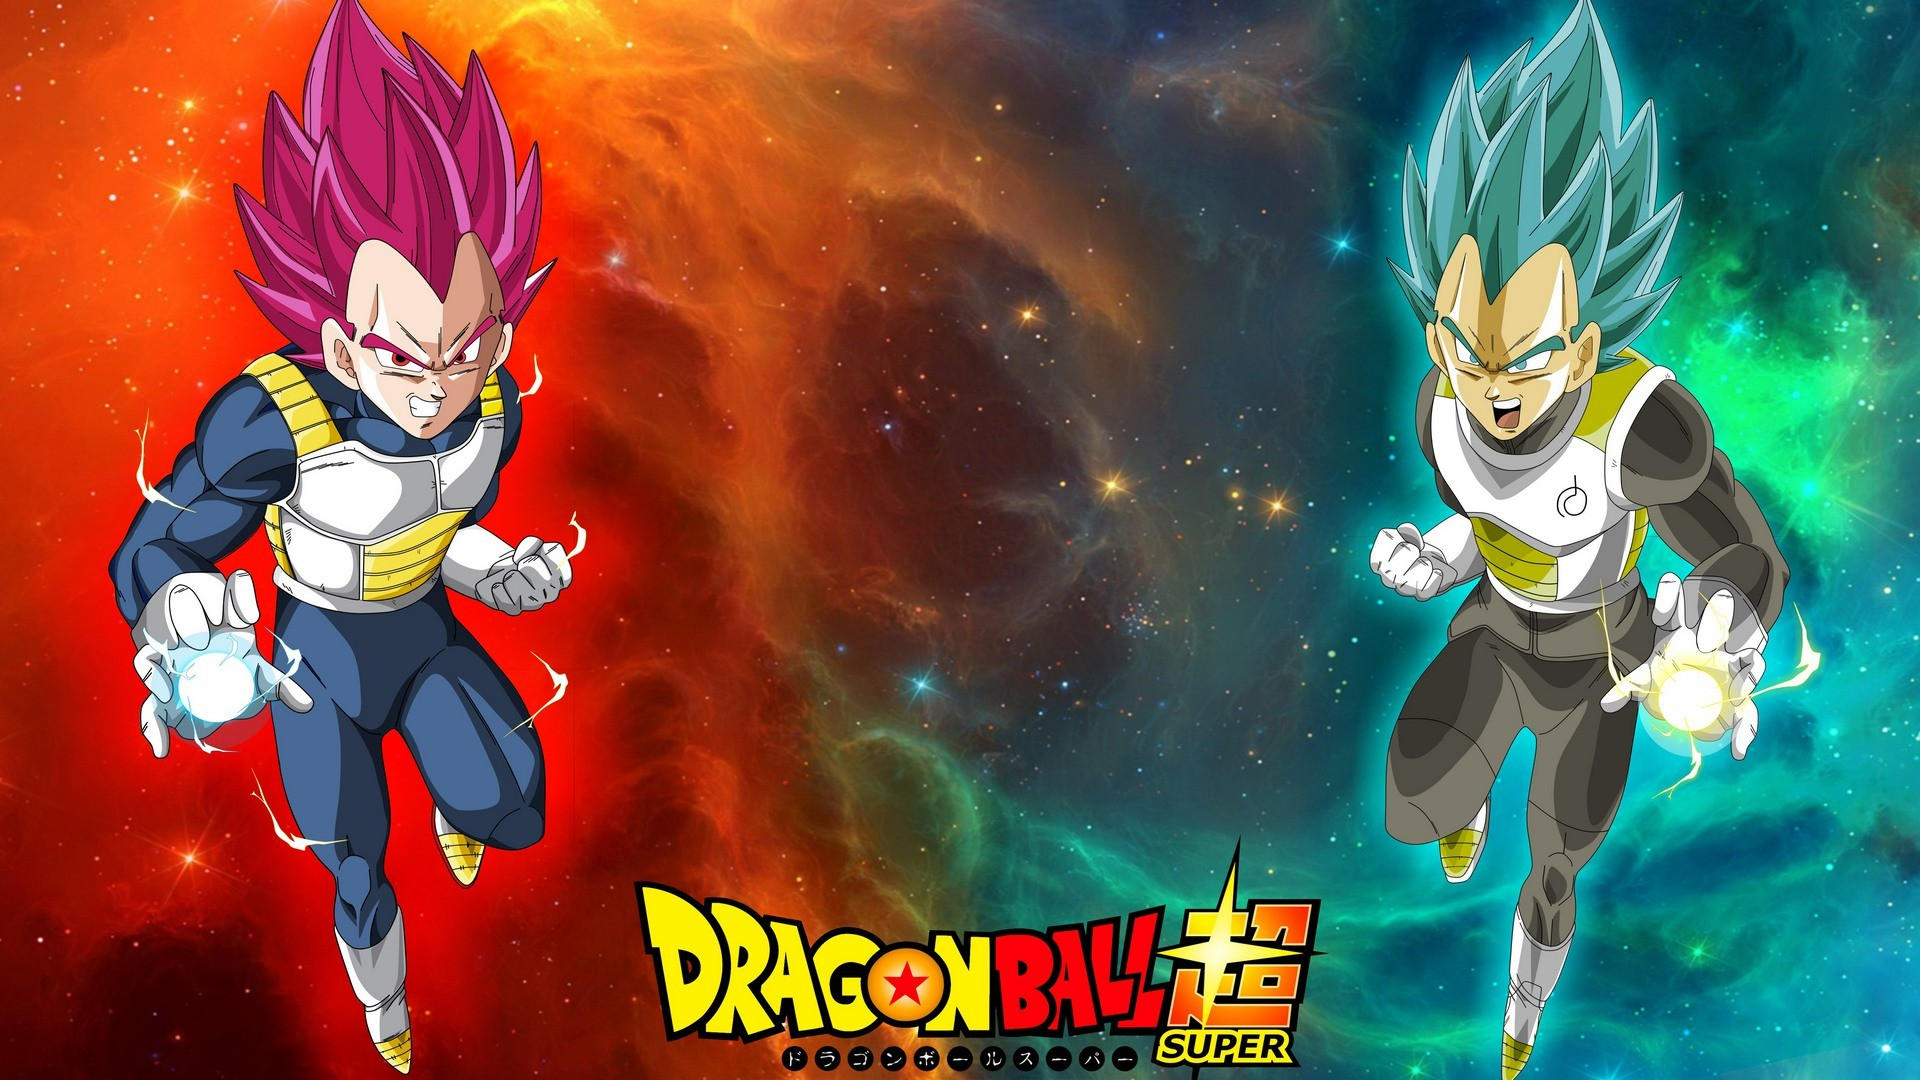 Hd Dragon Ball Super Wallpaper: Dragon Ball HD Wallpapers (71+ Images